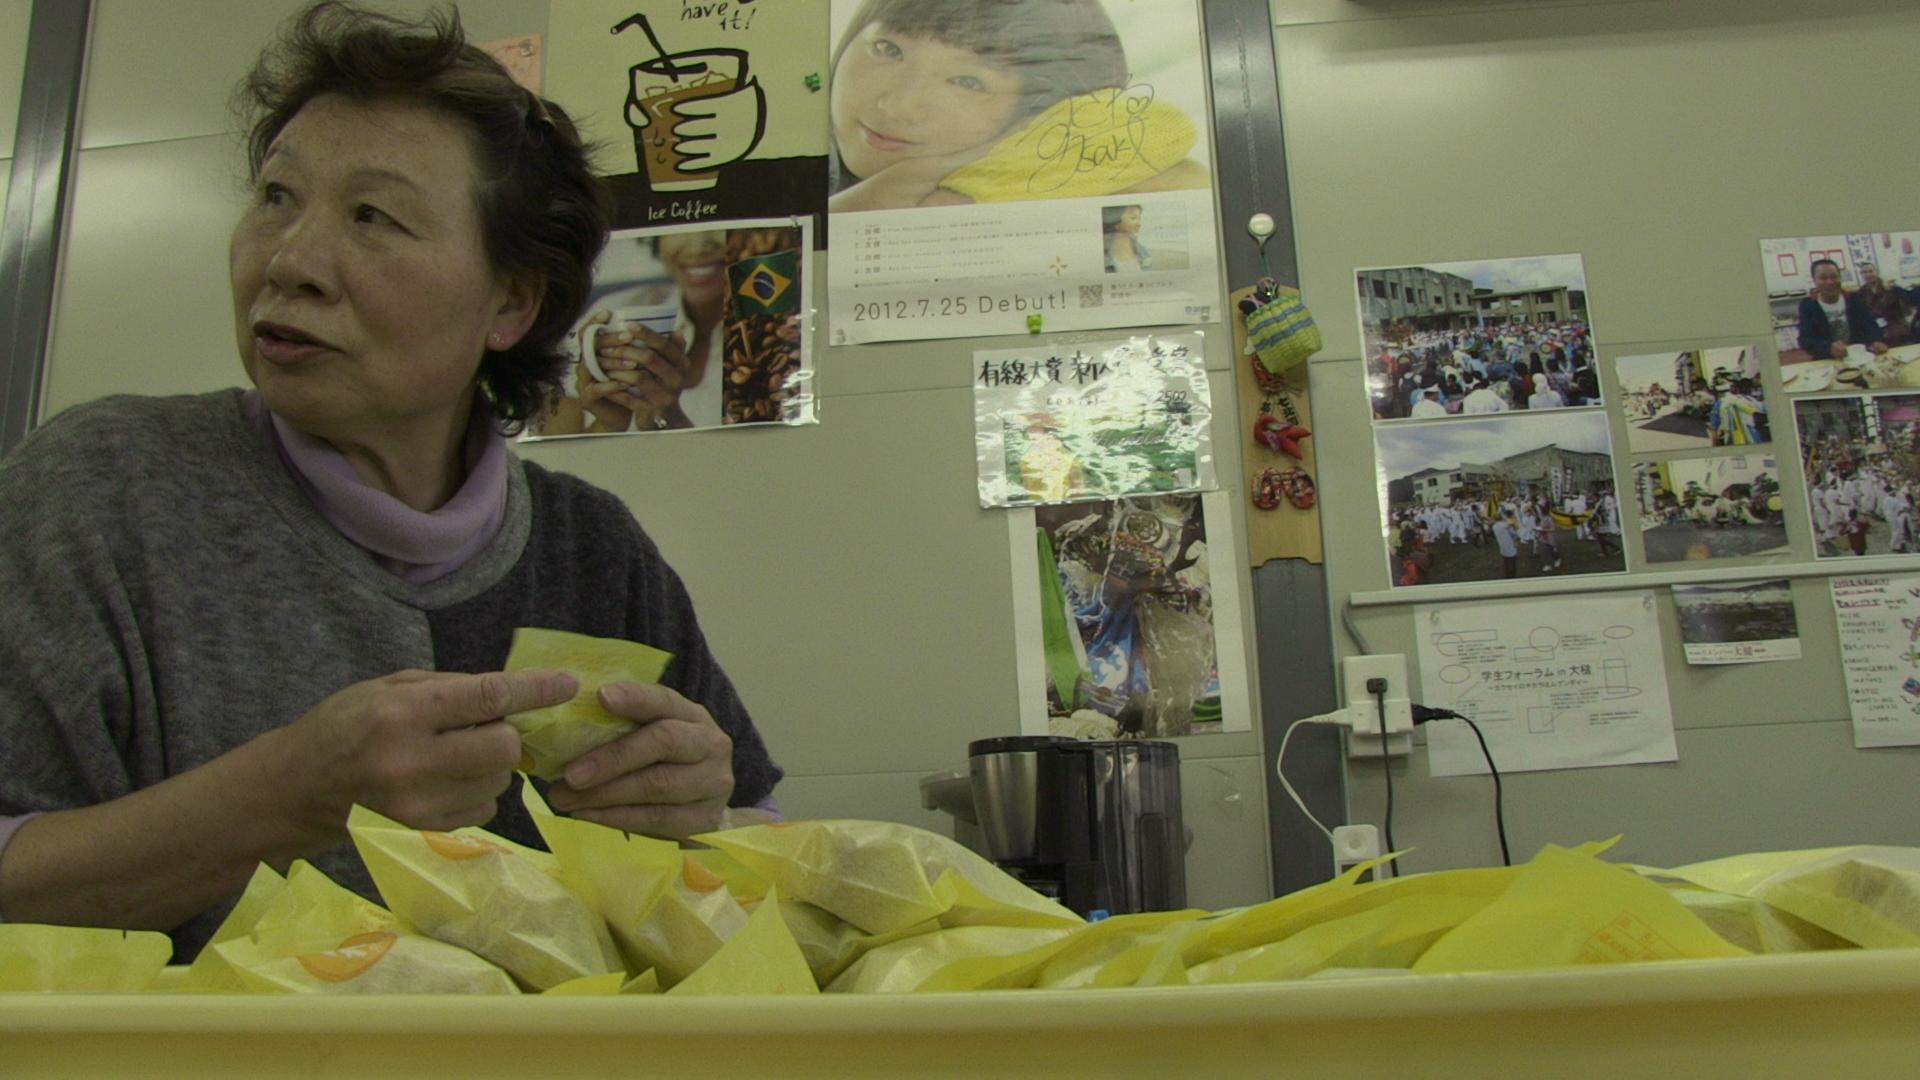 otsuchi temp bakery osaka interview.JPG